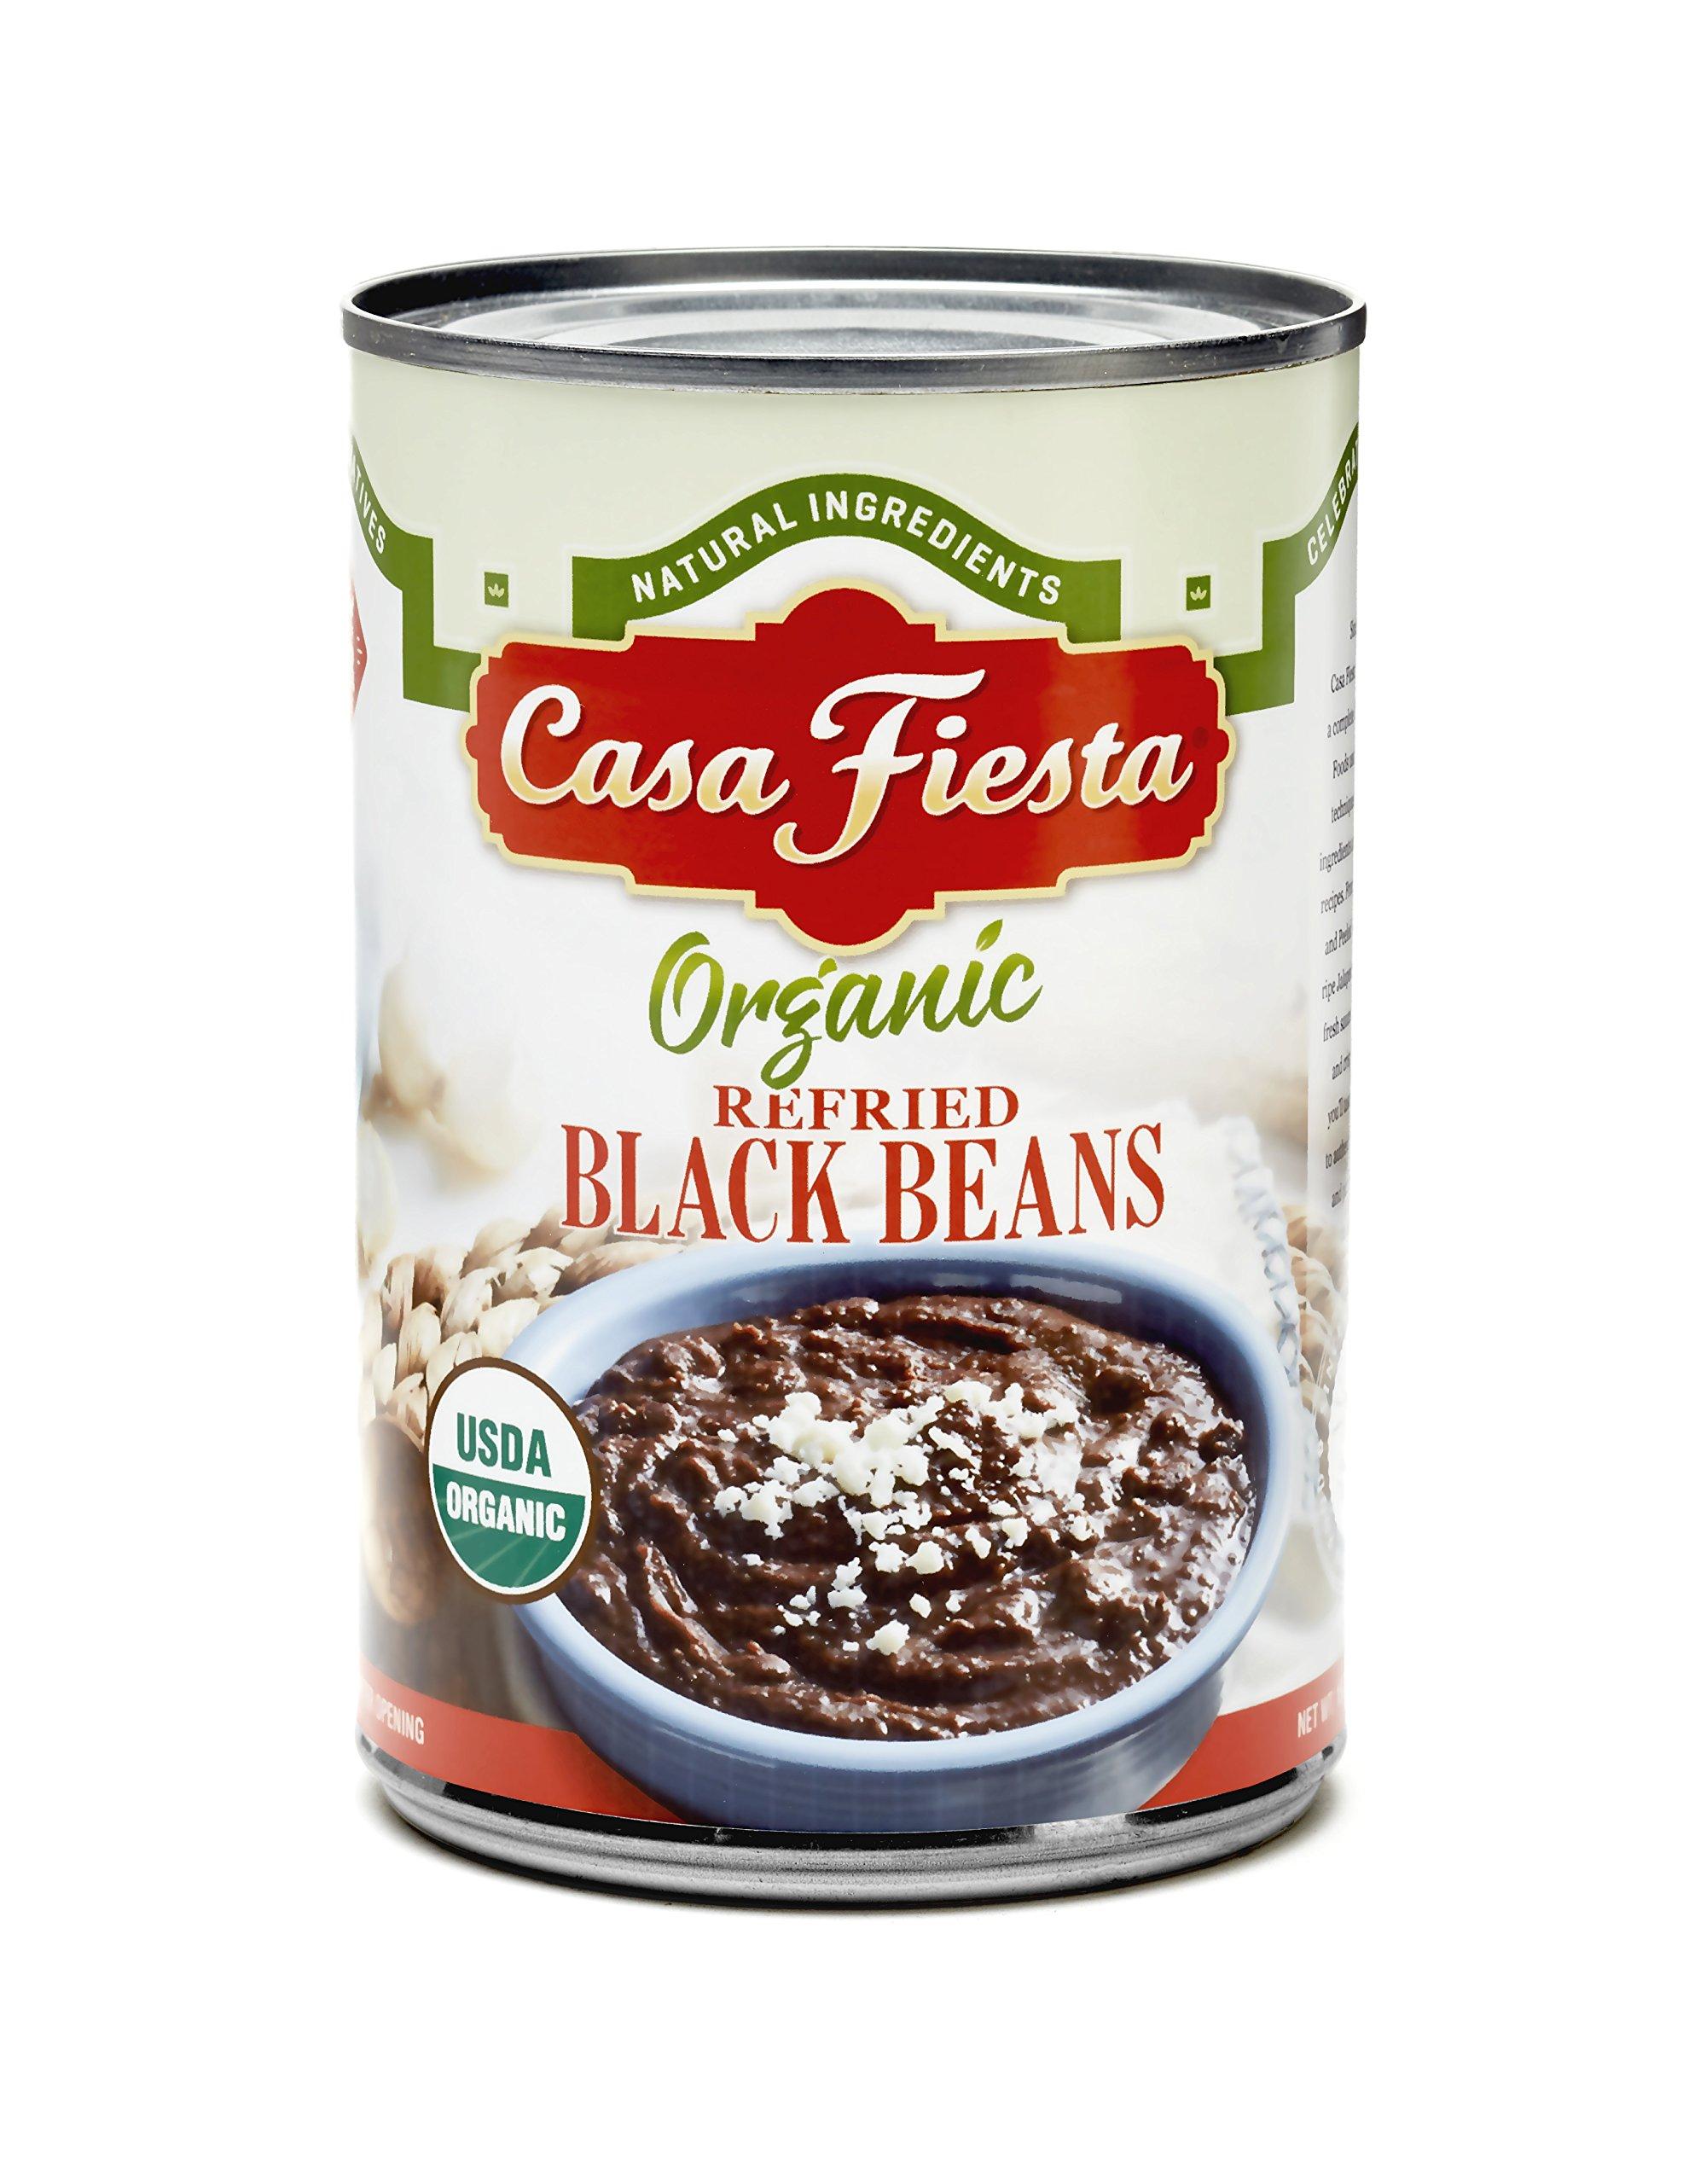 Casa Fiesta Organic Refried Black Beans 16 oz 12 pack